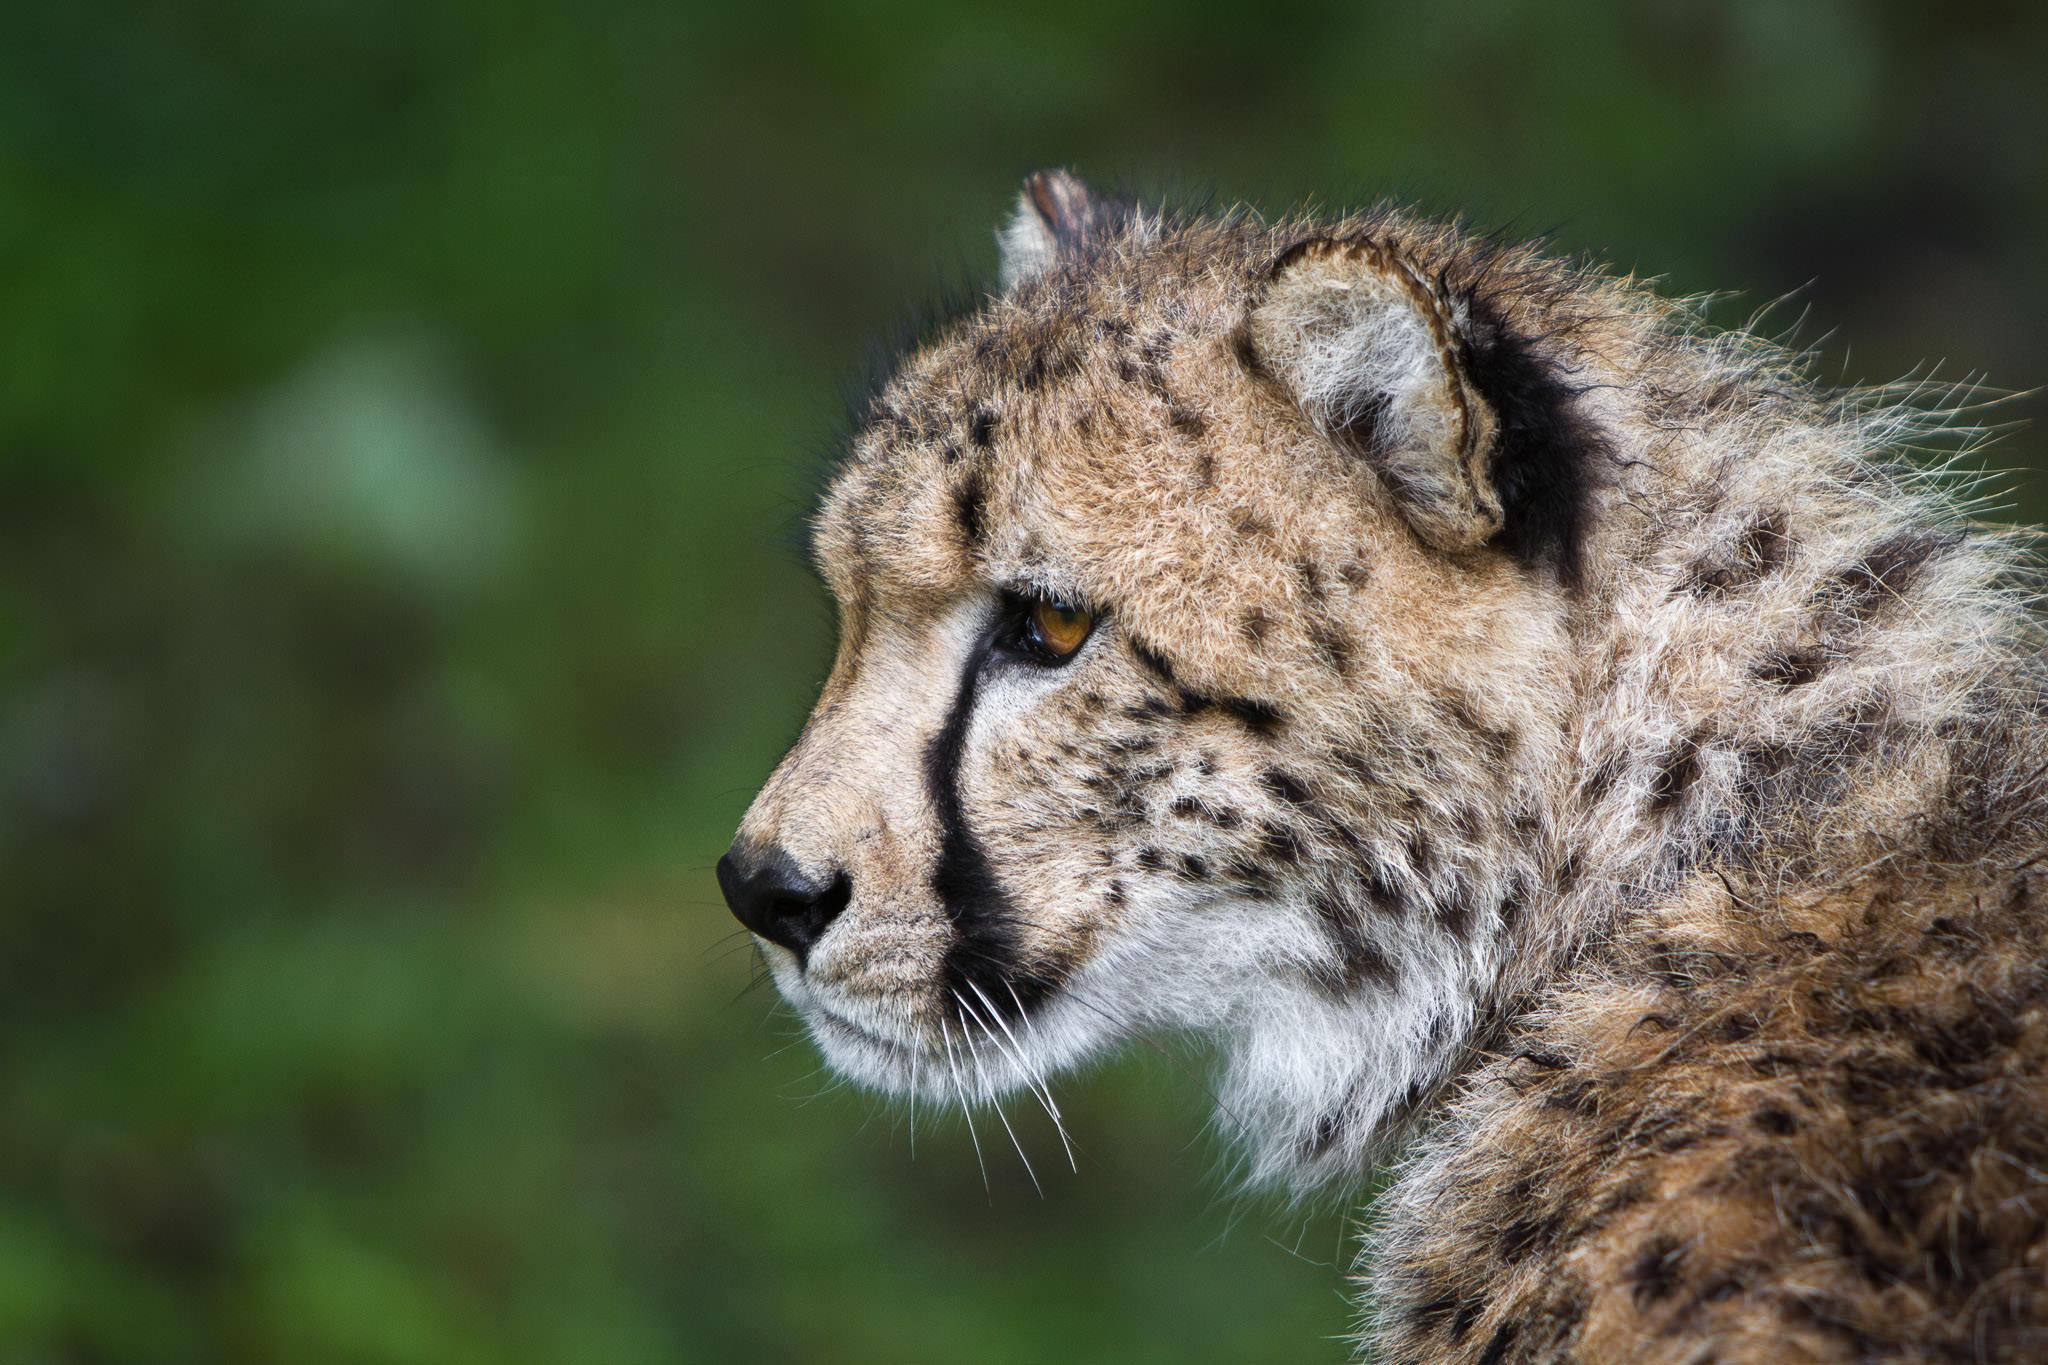 Cheetah #20130527_0083-3